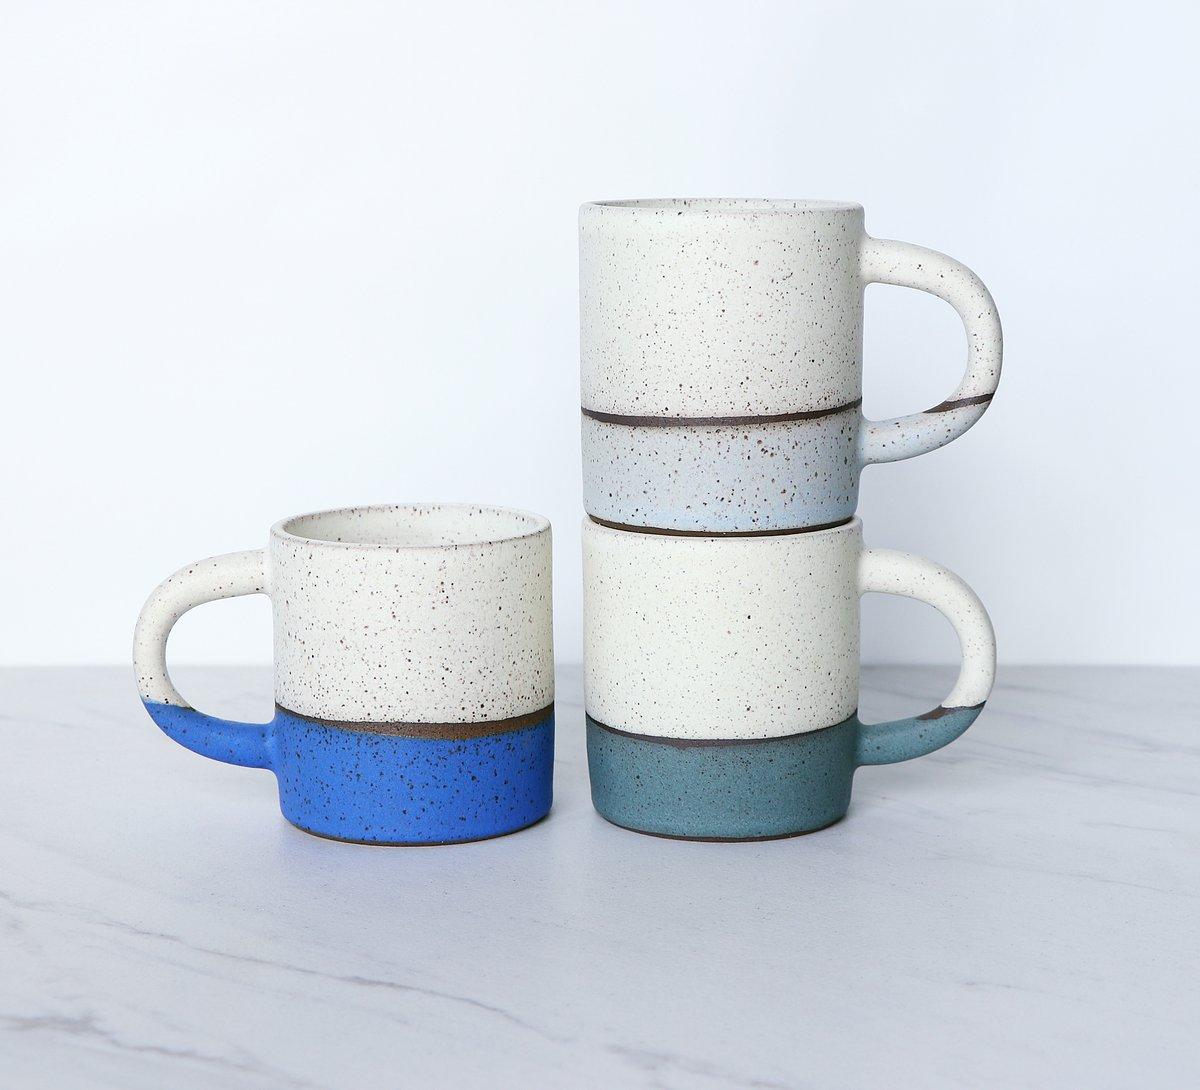 Image of Espresso, cortado cup with handle, speckled clay, two-tone glaze